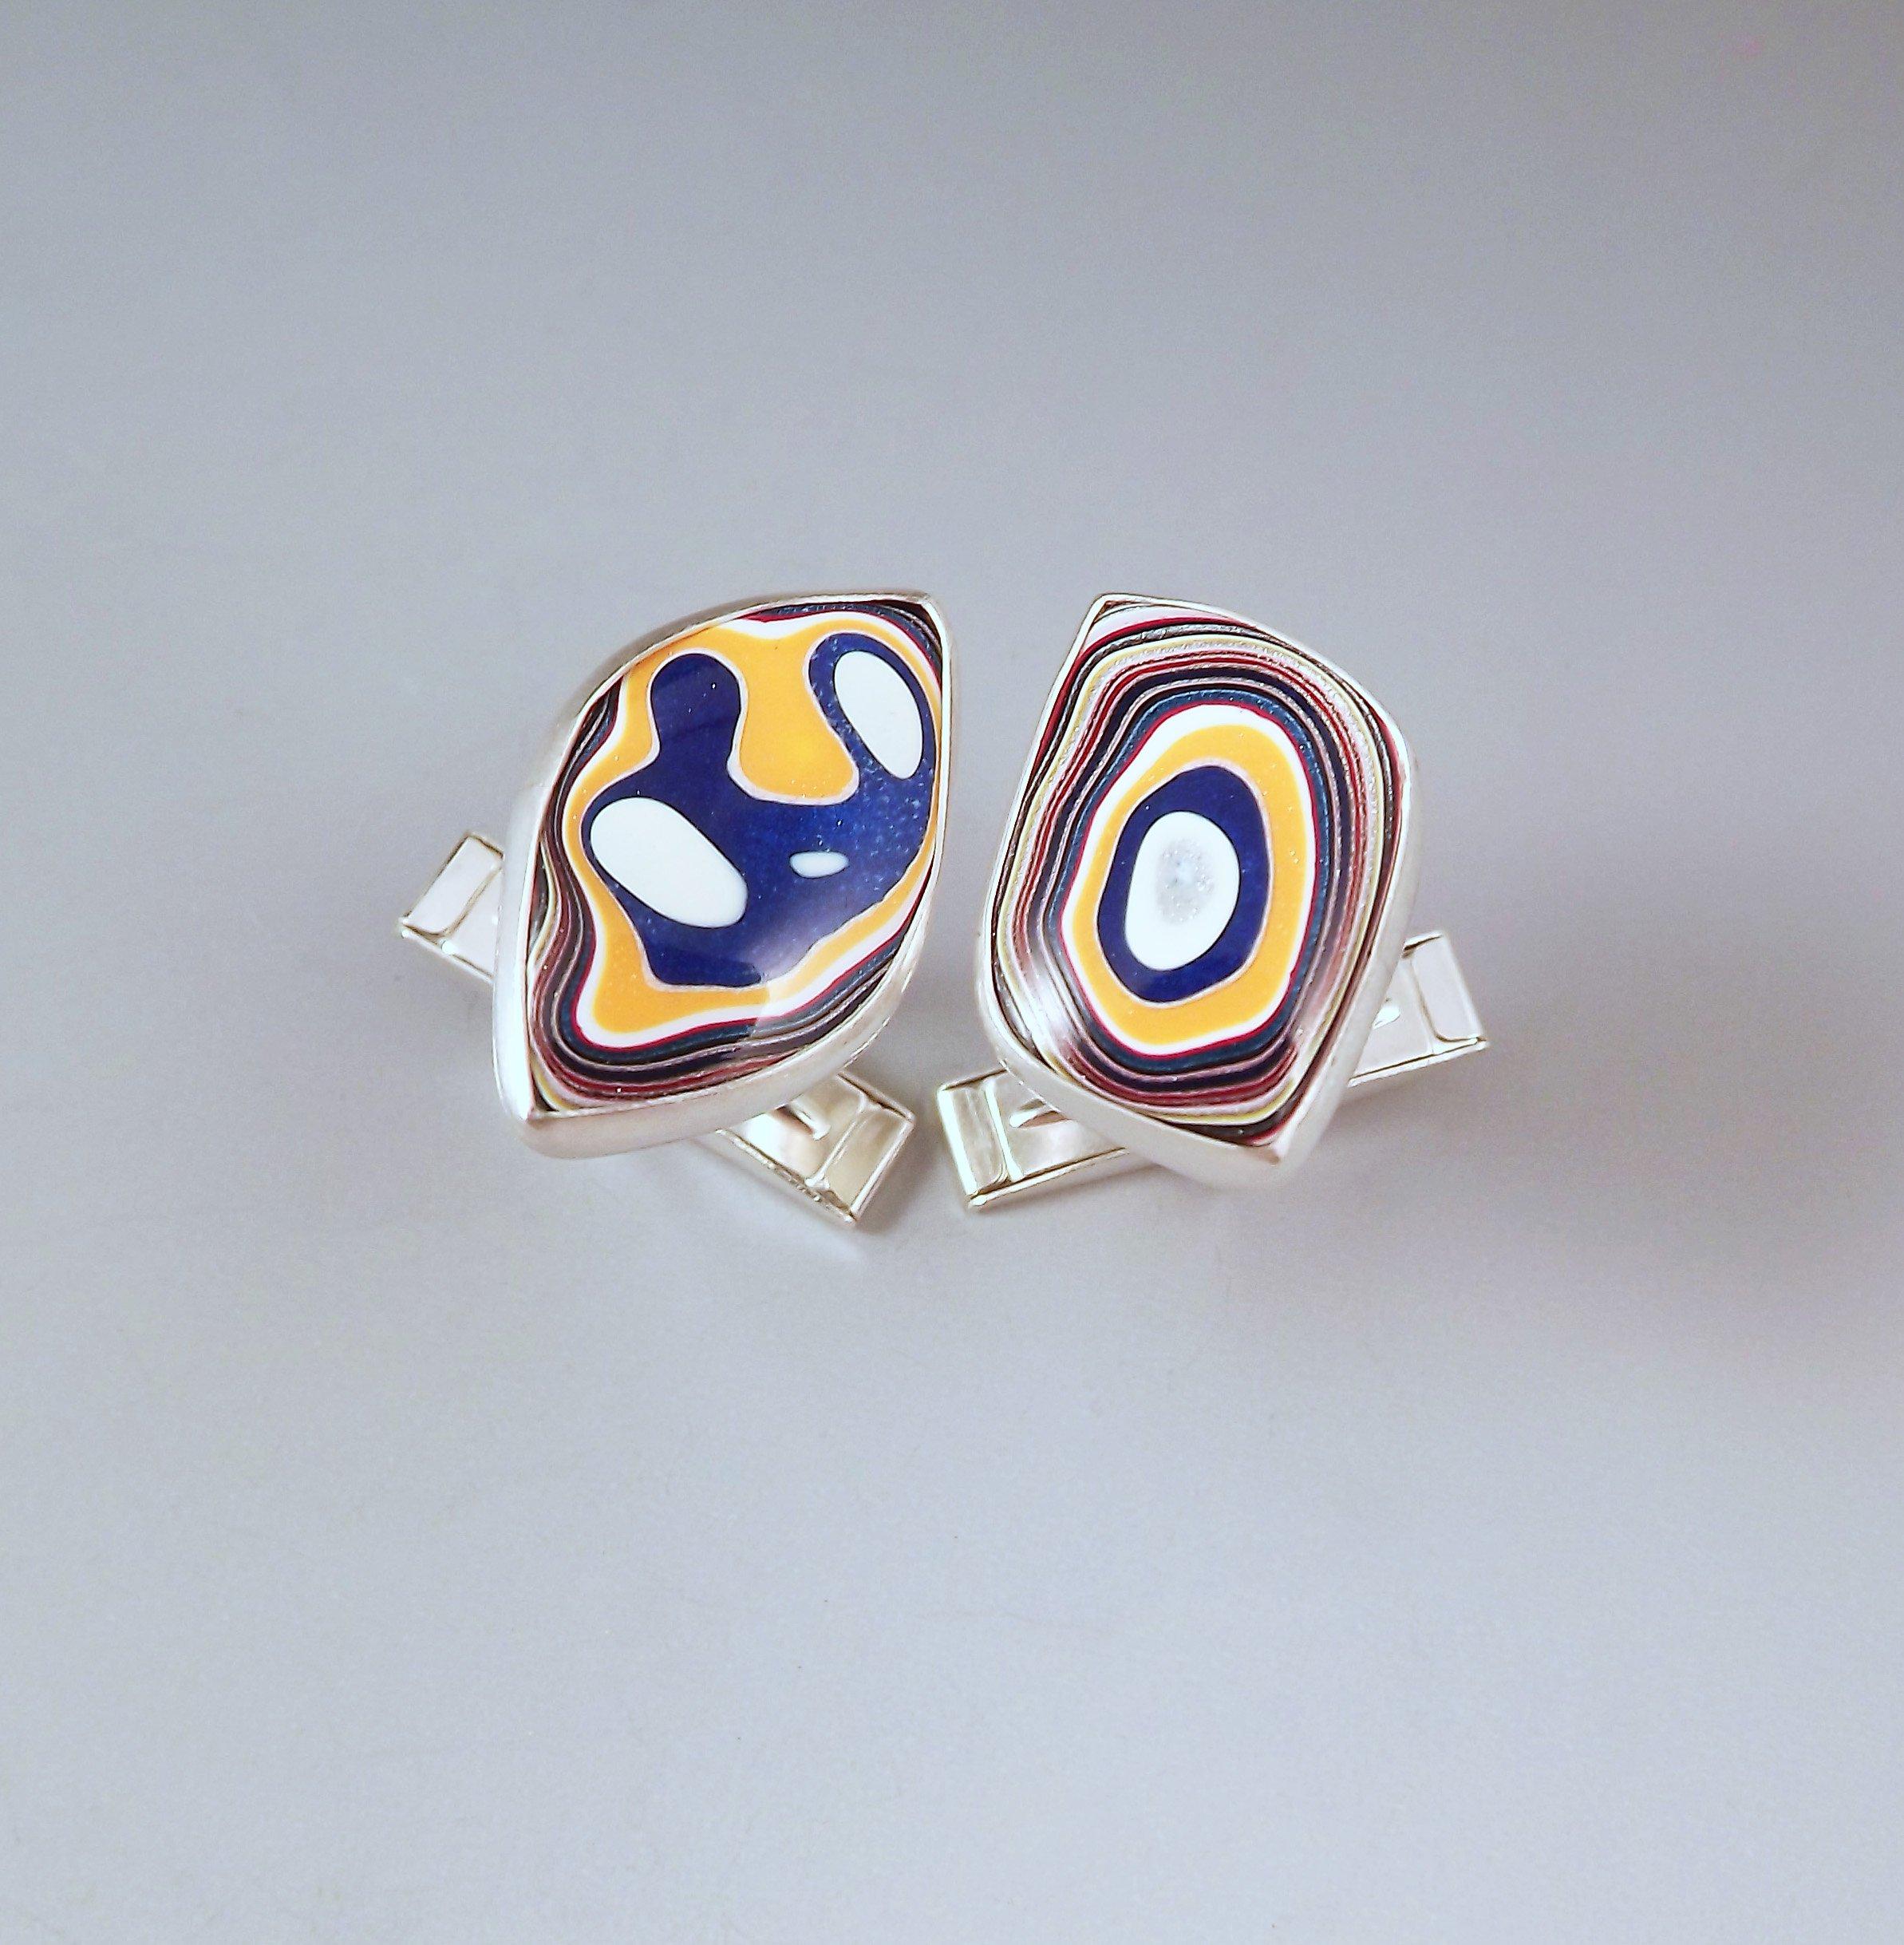 Fordite- Michigan Colors- U of M- Michigan Jewelry- Men's Jewelry- Sterling Silver Fordite Cufflinks by RedPaw